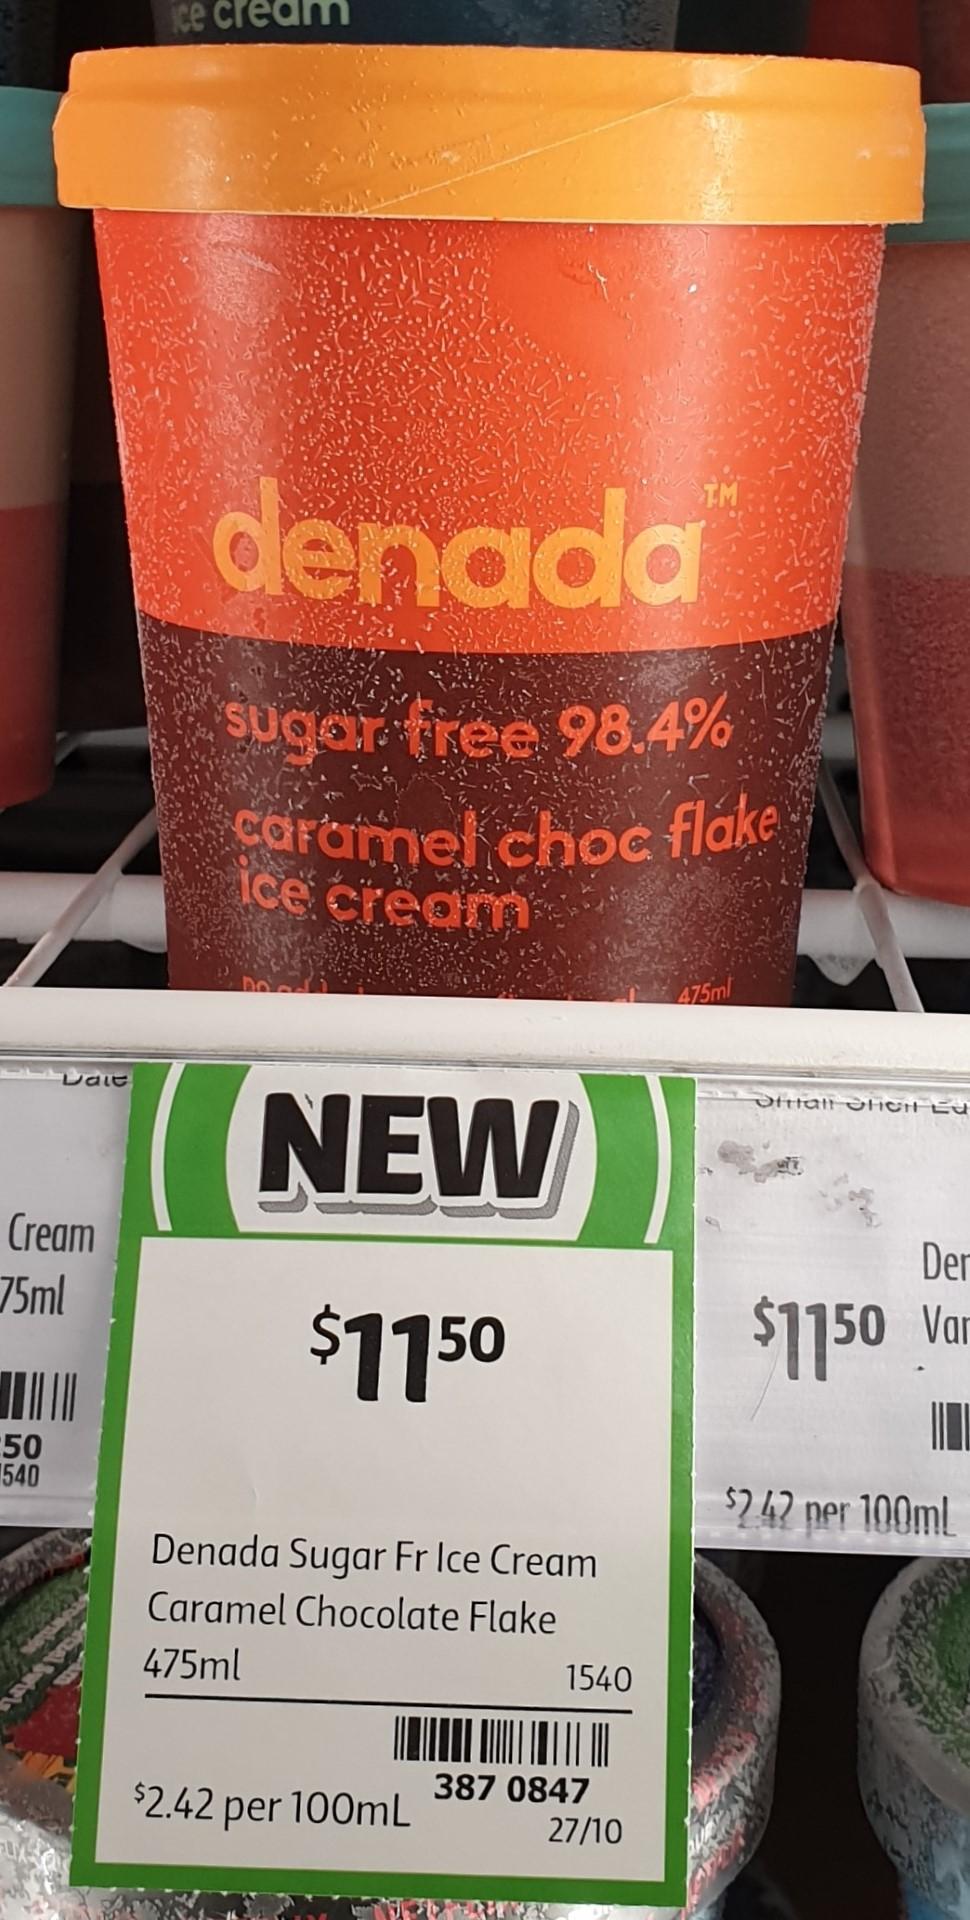 Denada 475mL Ice Cream Caramel Choc Flake